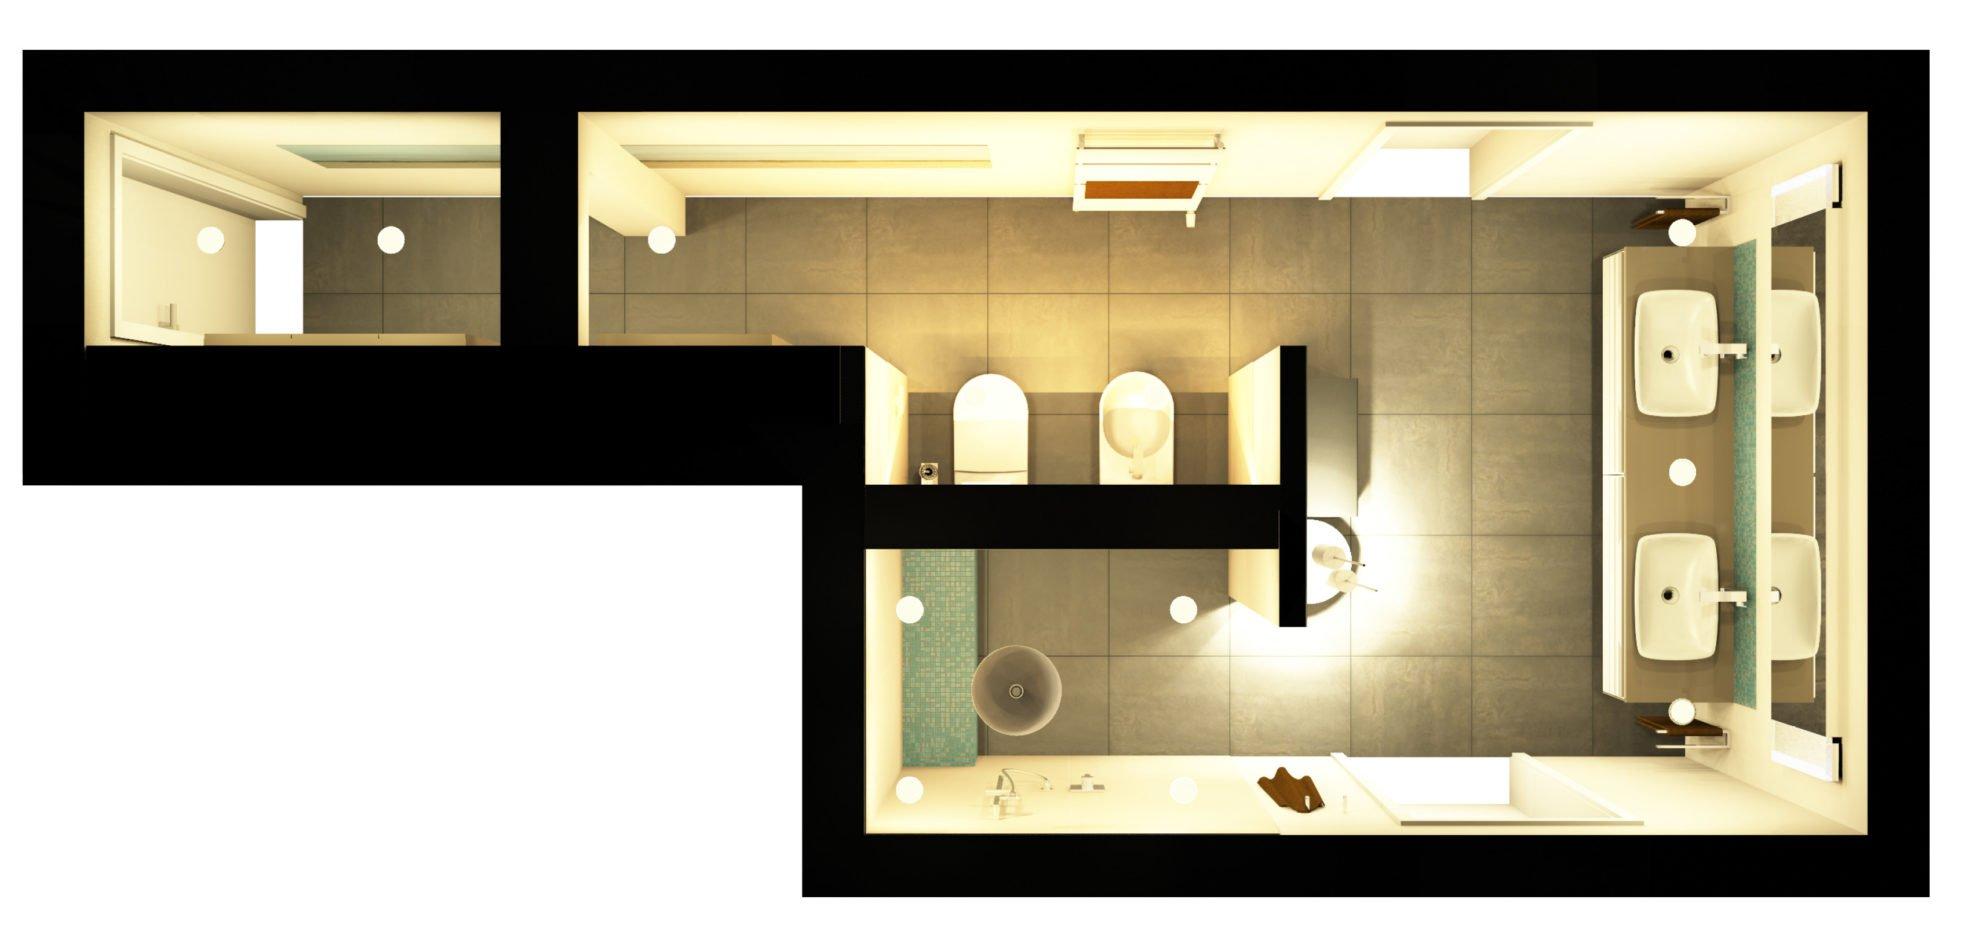 raumkonzept referenz bad 3d planung skizze nowak gmbh bergisch gladbach. Black Bedroom Furniture Sets. Home Design Ideas